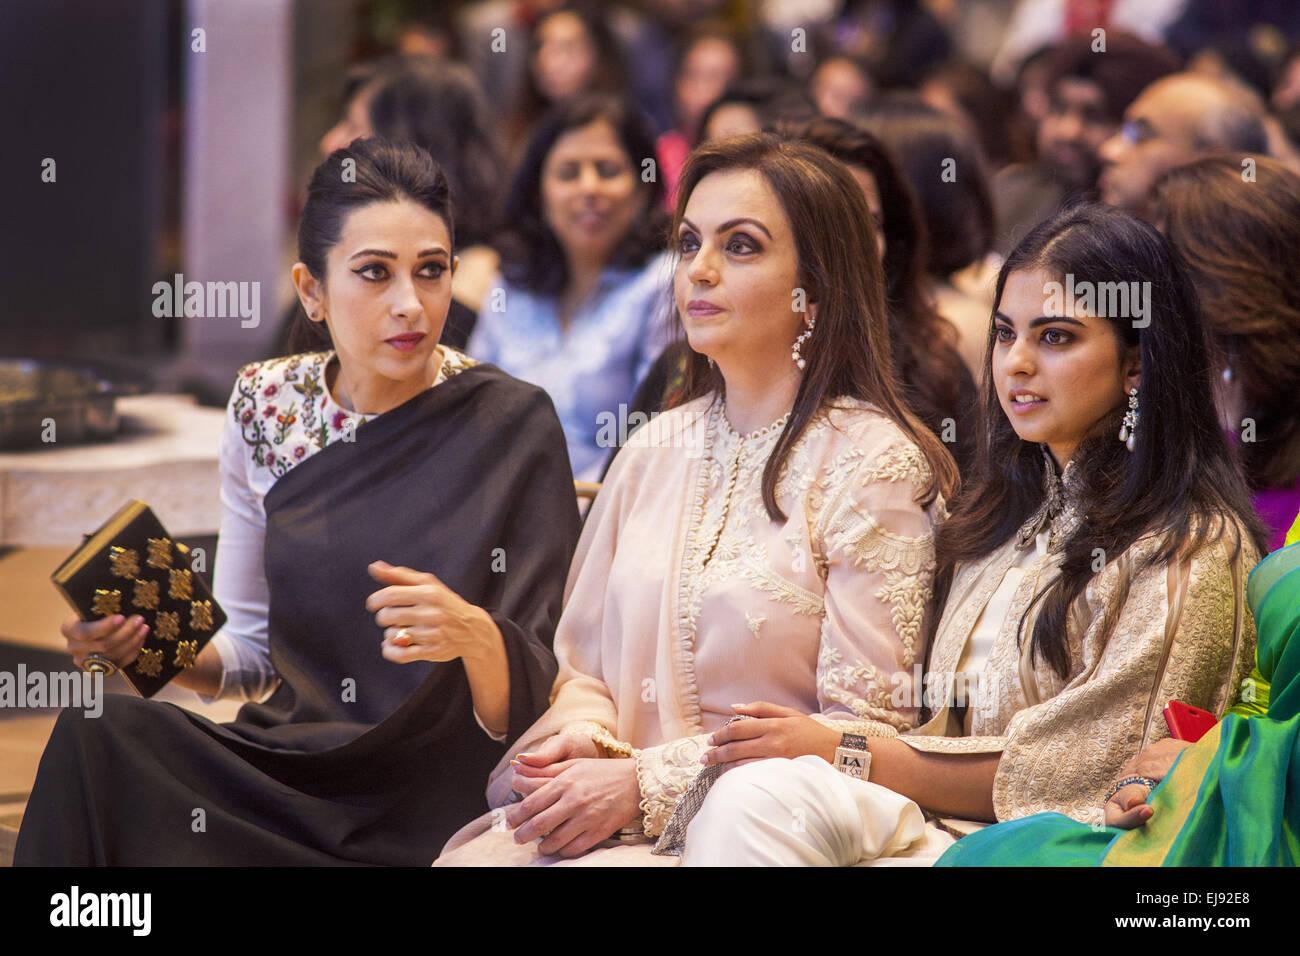 Mumbai, Maharashtra, India. 22nd Mar, 2015. 22 March 2015 : Mumbai - INDIA.Bollywood Actress Karishma Kapoor (L), - Stock Image